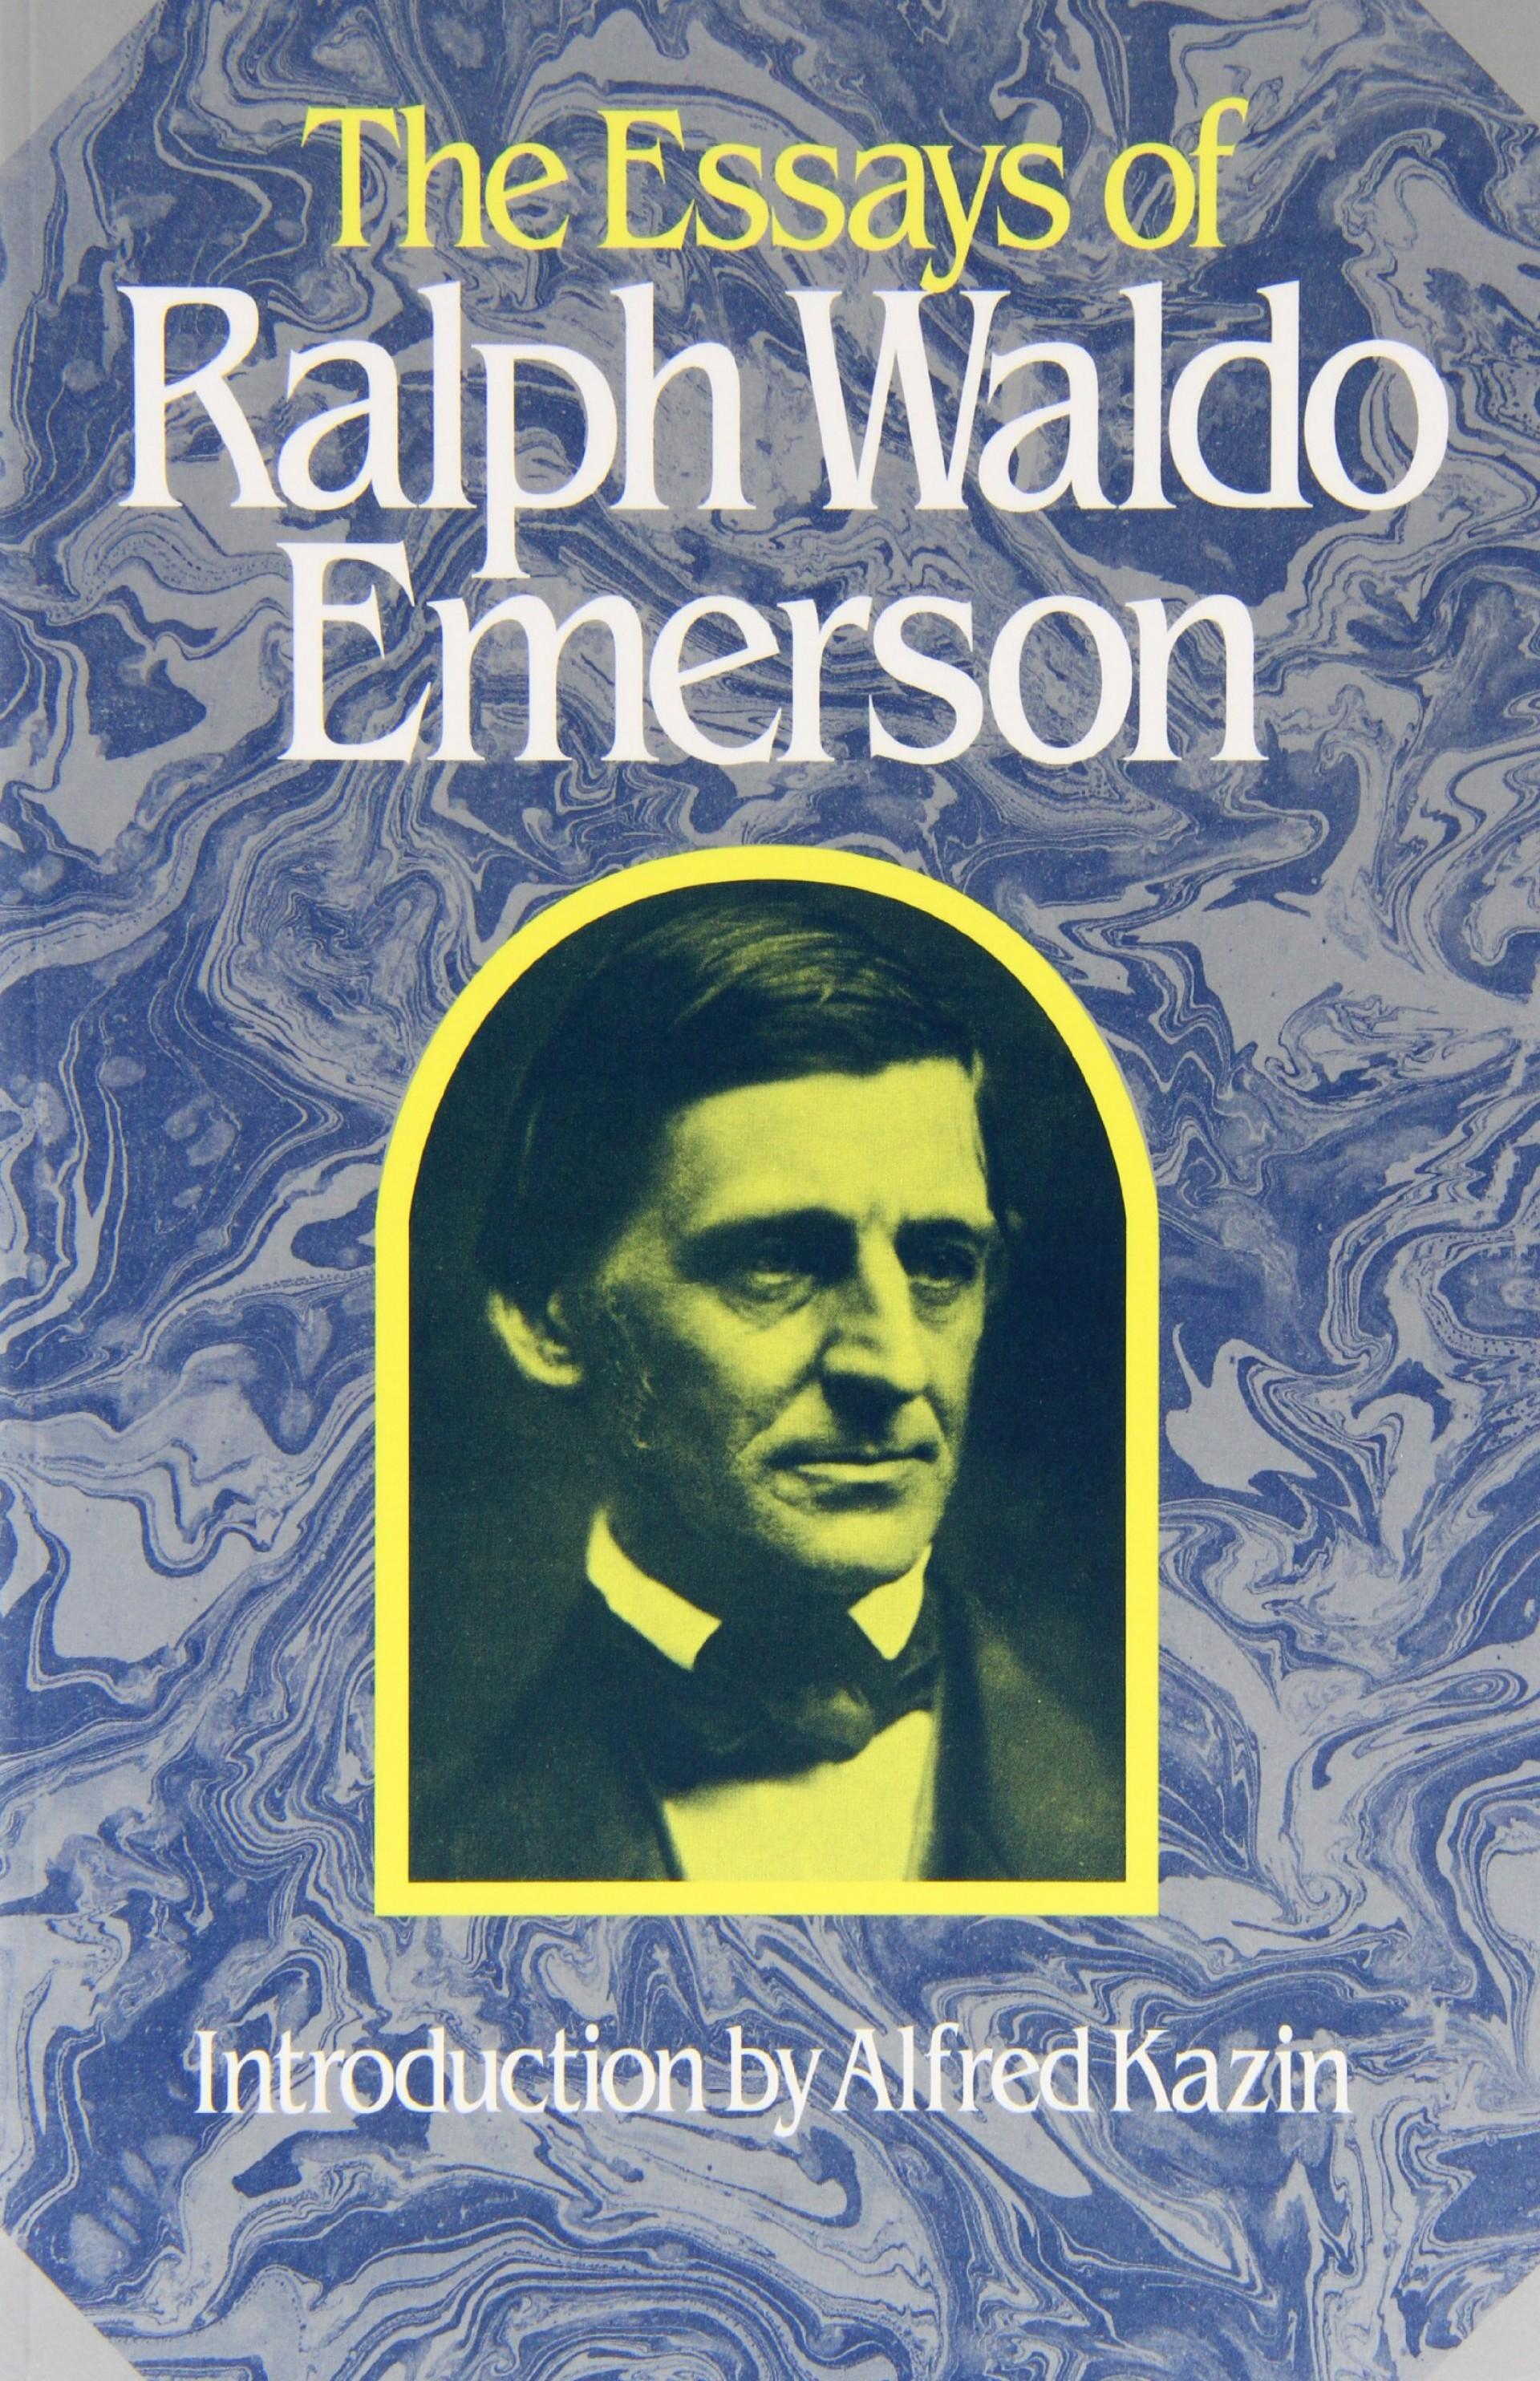 021 Essay Example 91blpvu4wrl Self Reliance And Other Formidable Essays Ekşi Self-reliance (dover Thrift Editions) Pdf Epub 1920